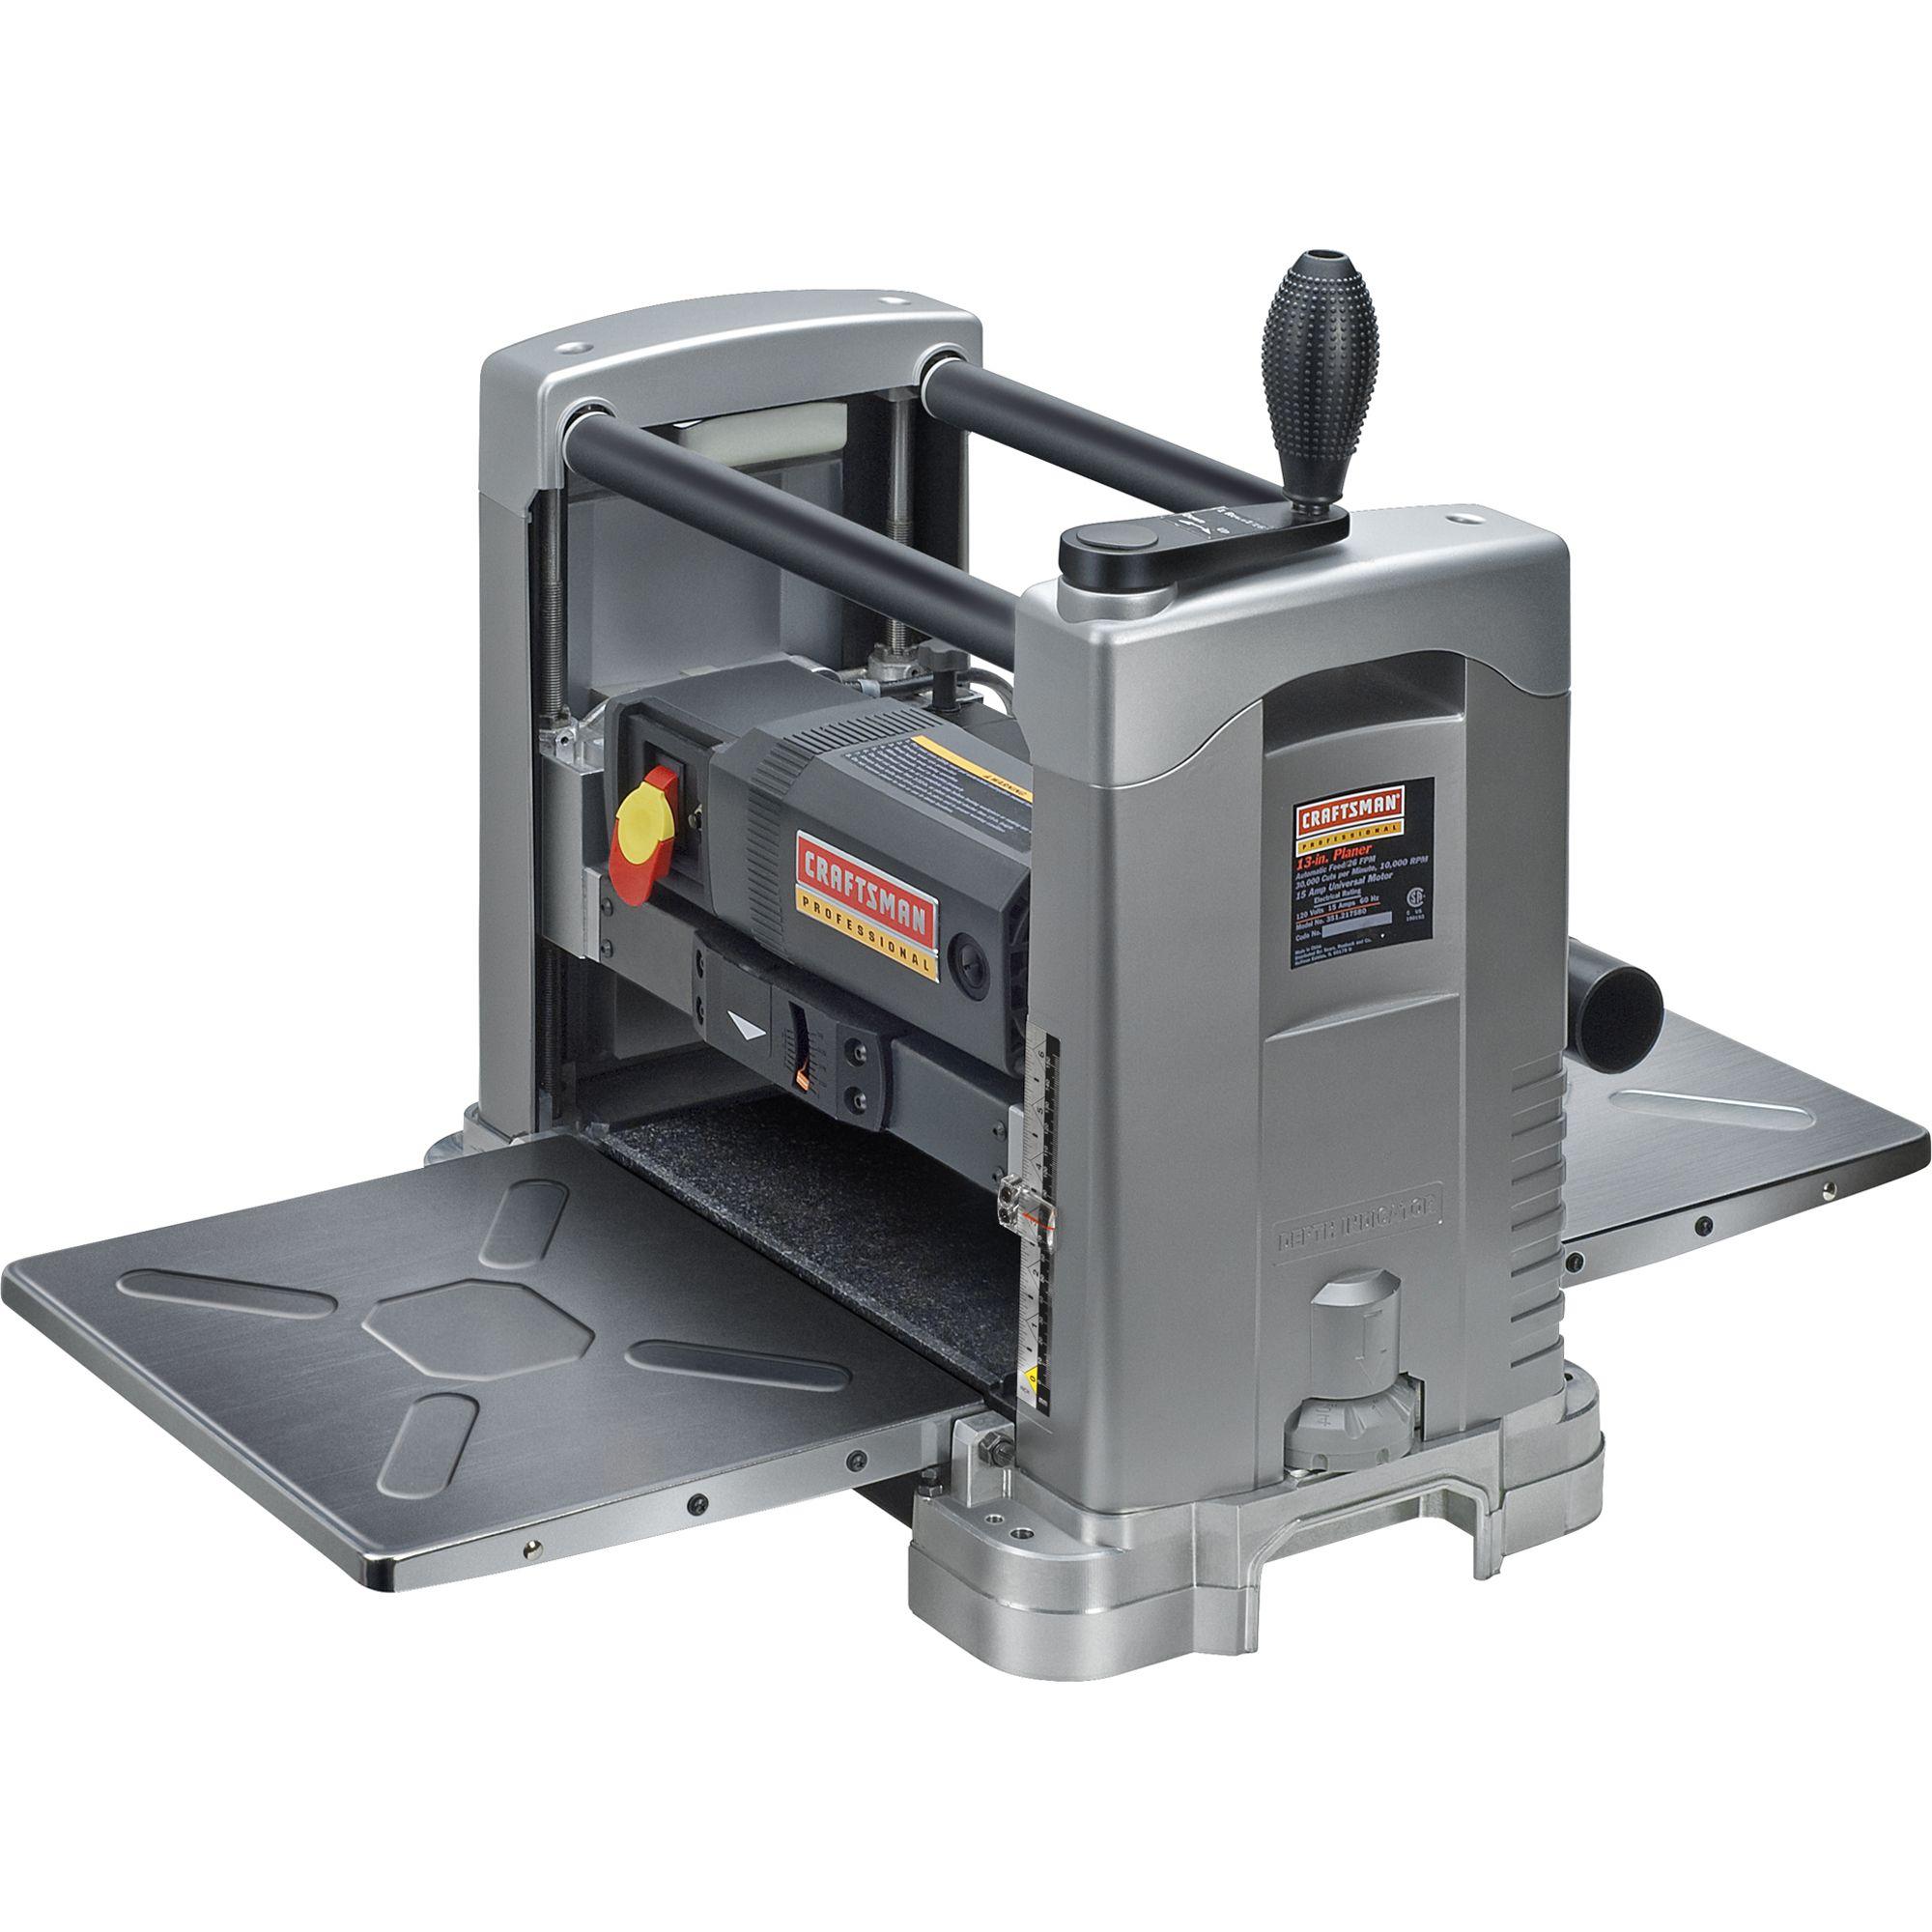 Craftsman Professional - 21748 15 Amp 13